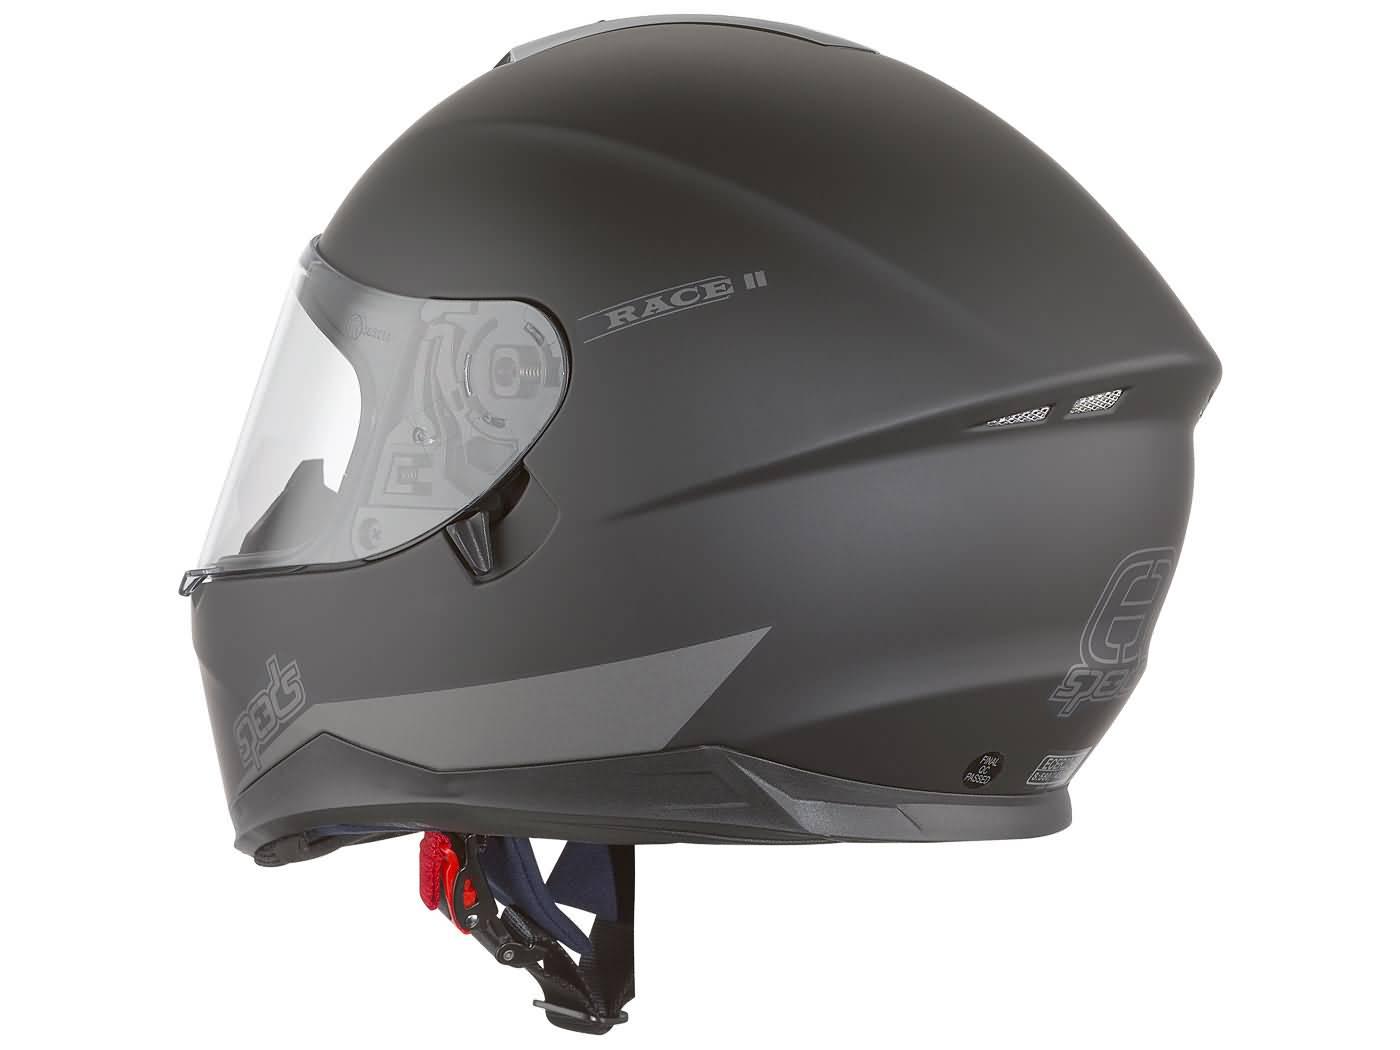 helm speeds integral race ii schwarz matt. Black Bedroom Furniture Sets. Home Design Ideas